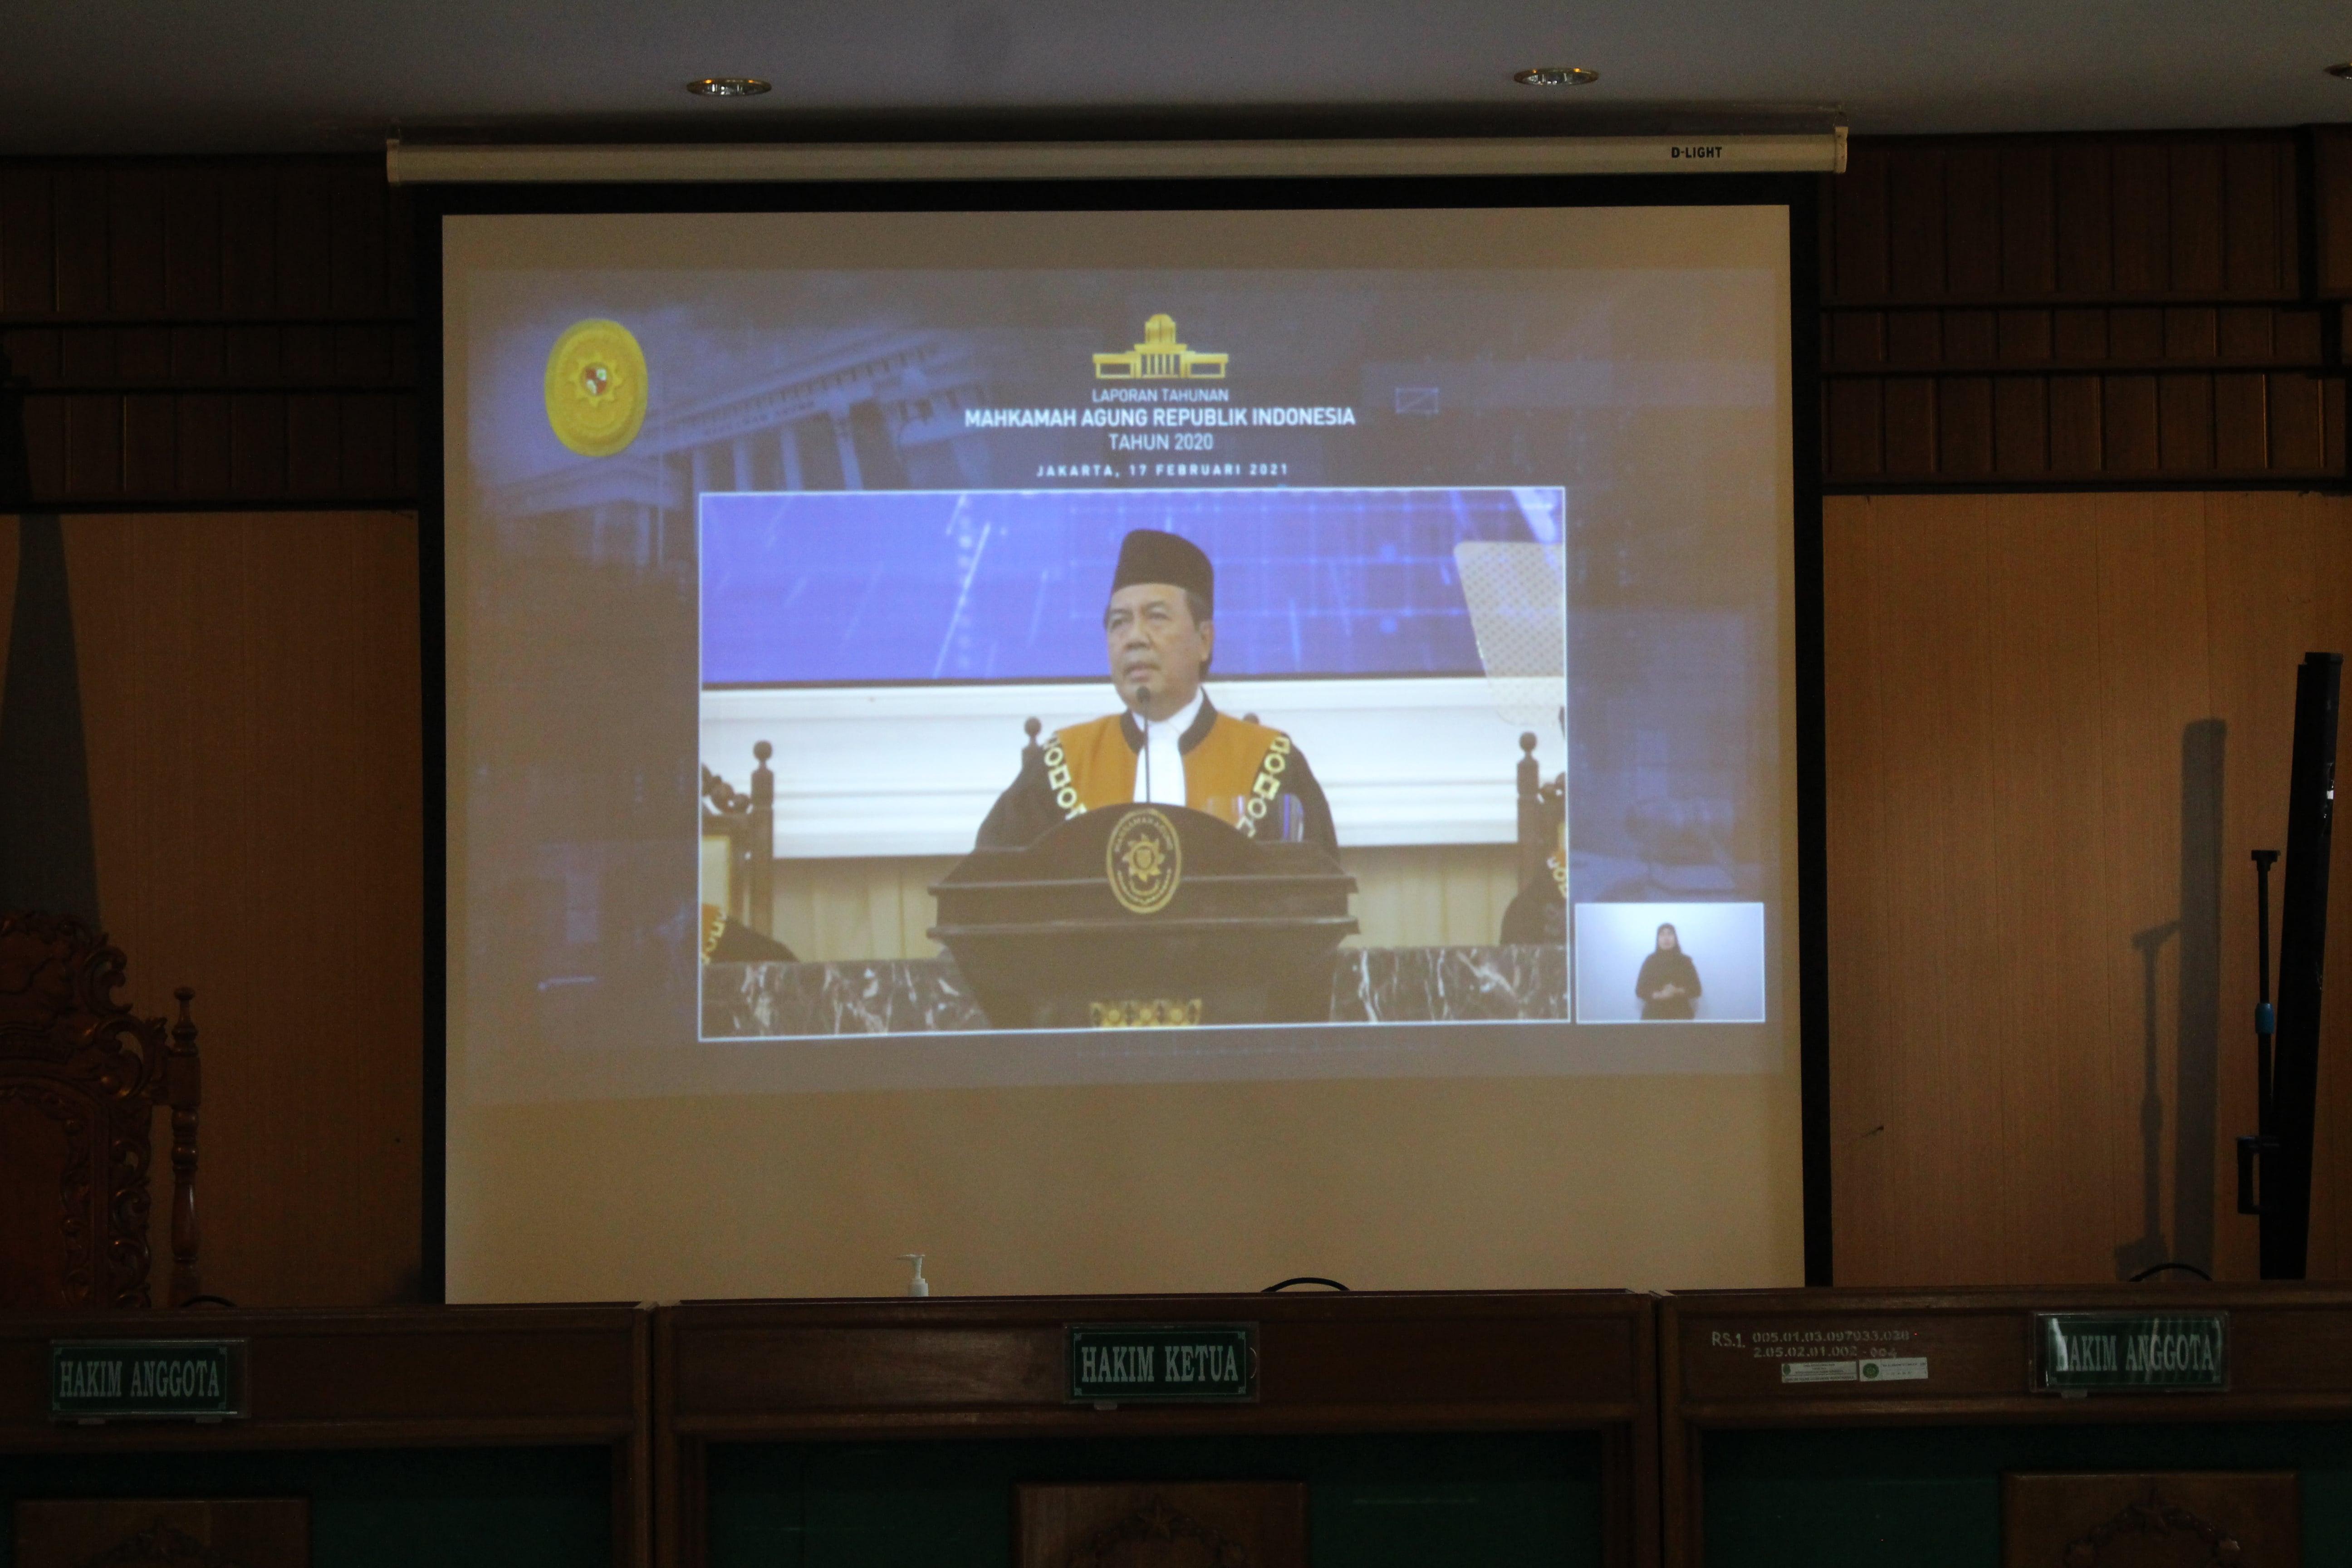 Laporan Tahunan Mahkamah Agung Republik Indonesia Tahun 2020